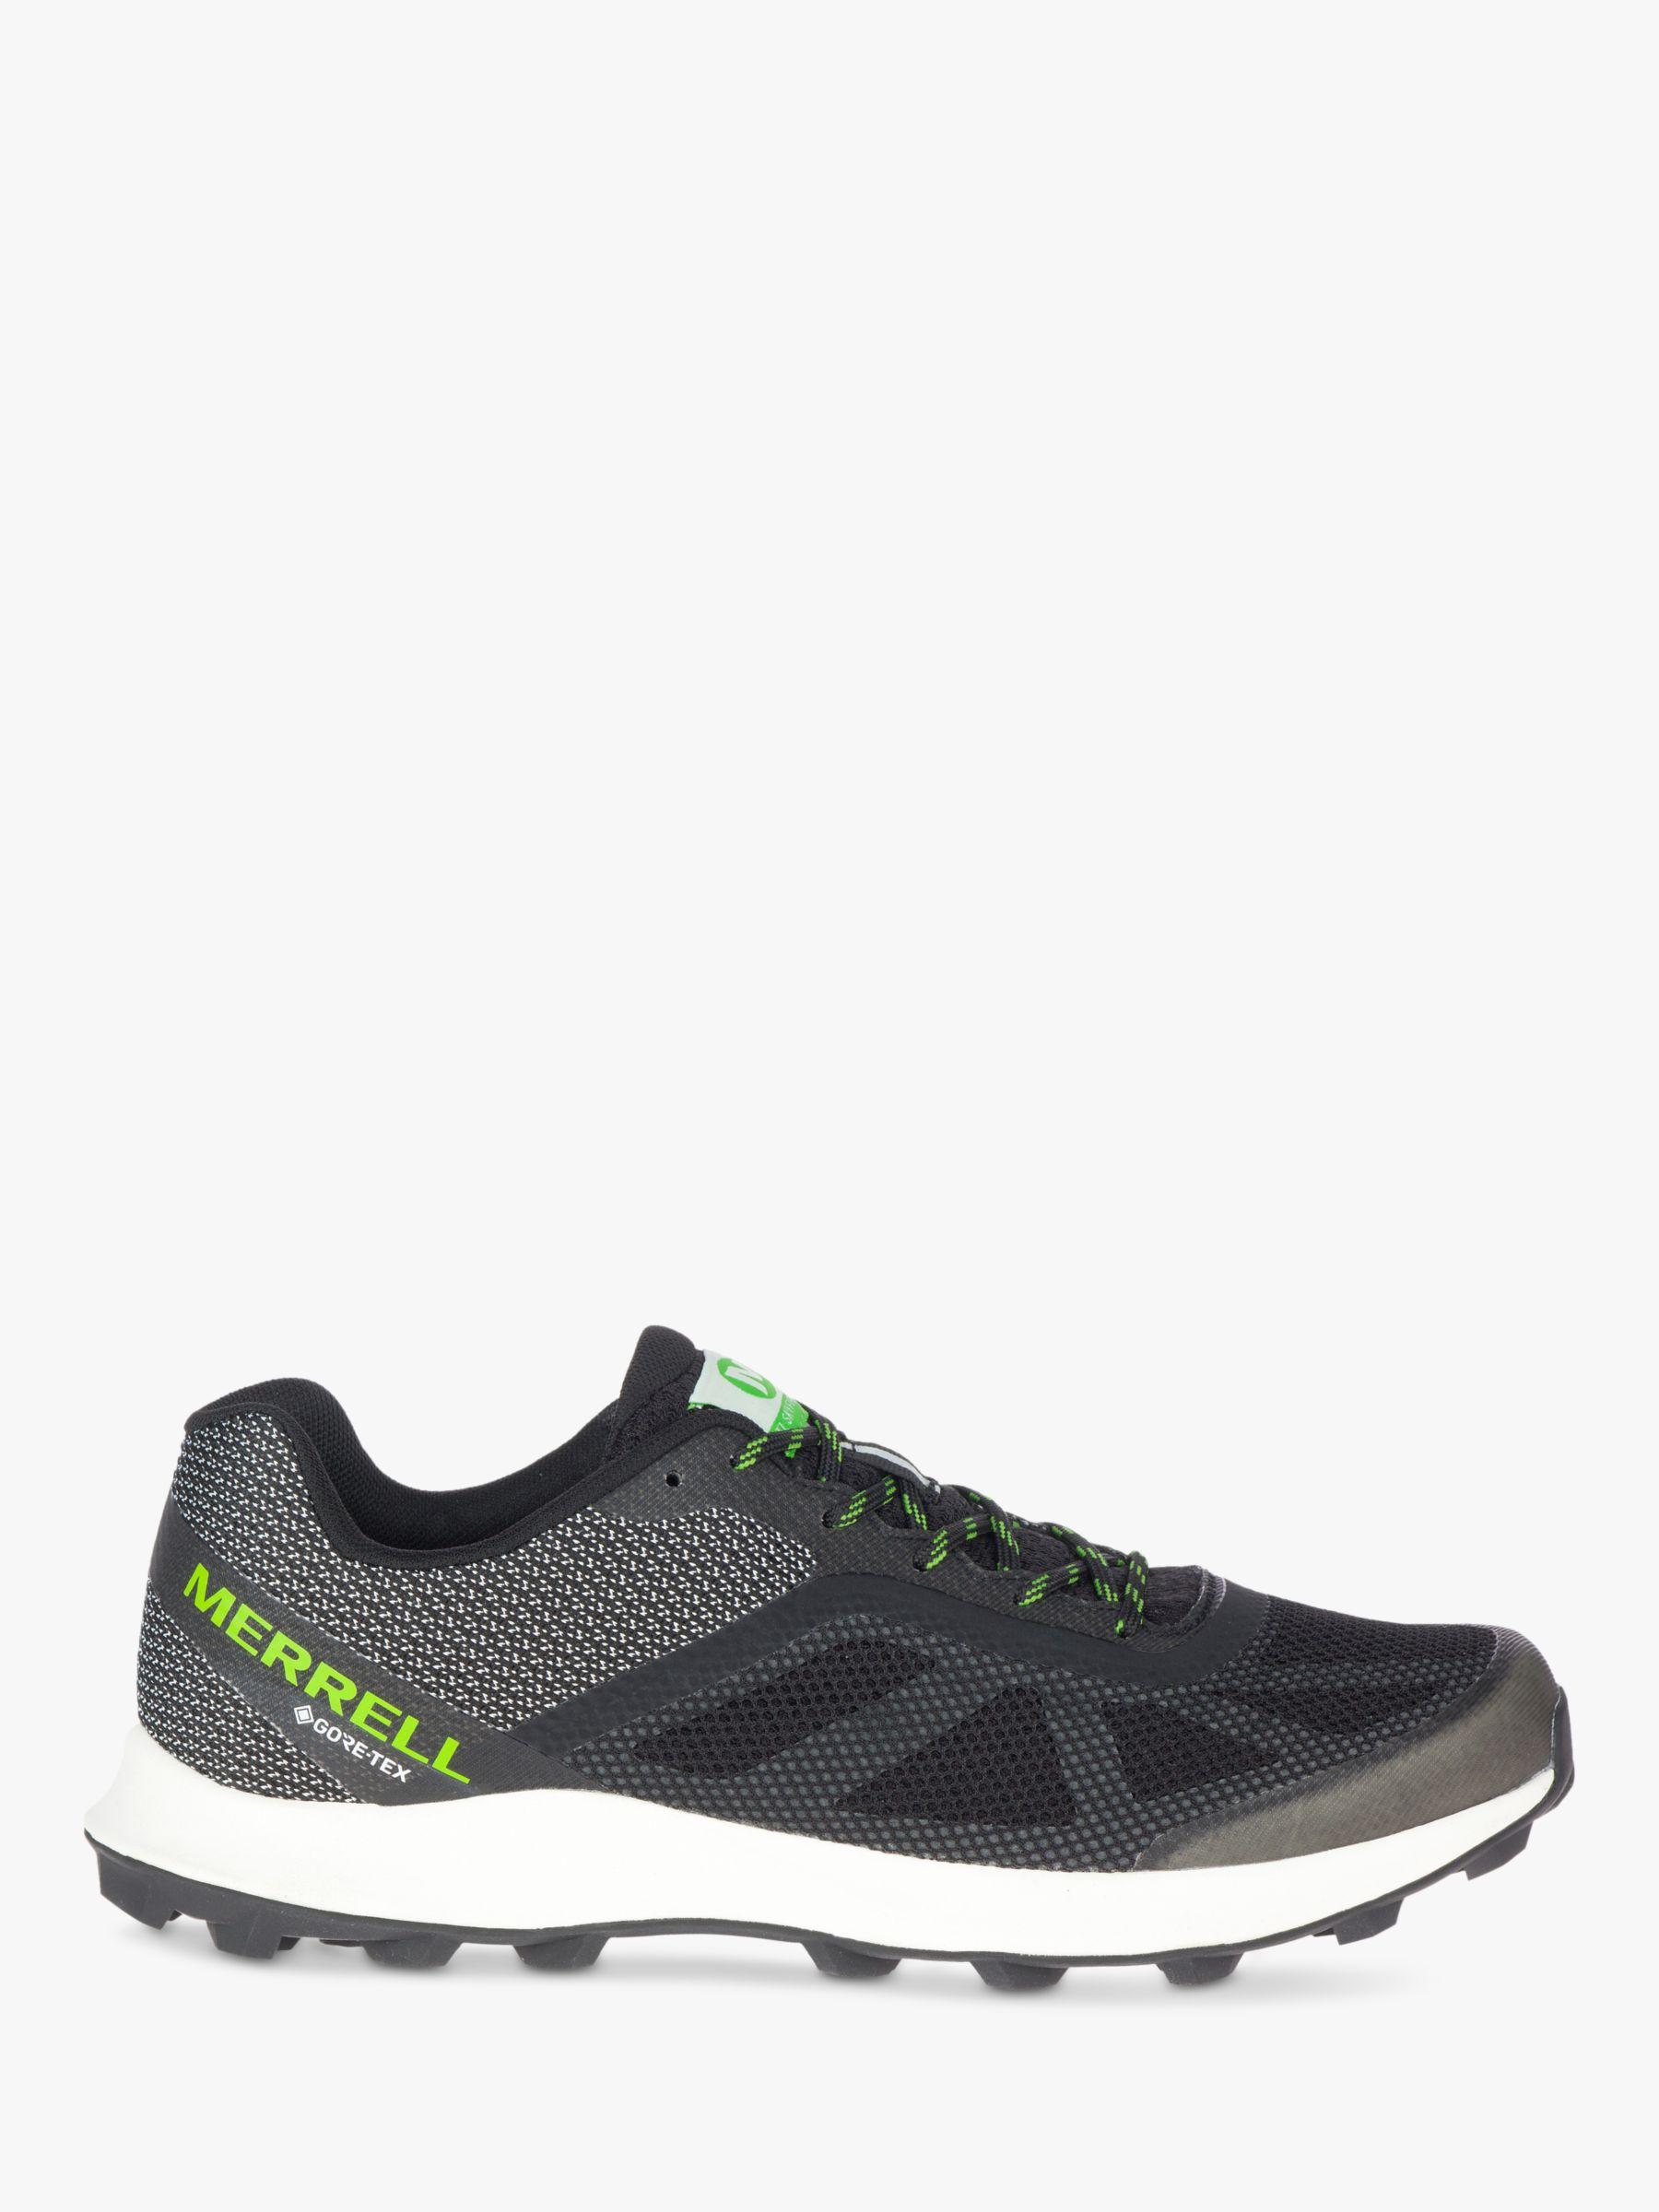 Merrell Merrell MTL Skyfire Men's Waterproof Gore-Tex Trail Running Shoes, Black